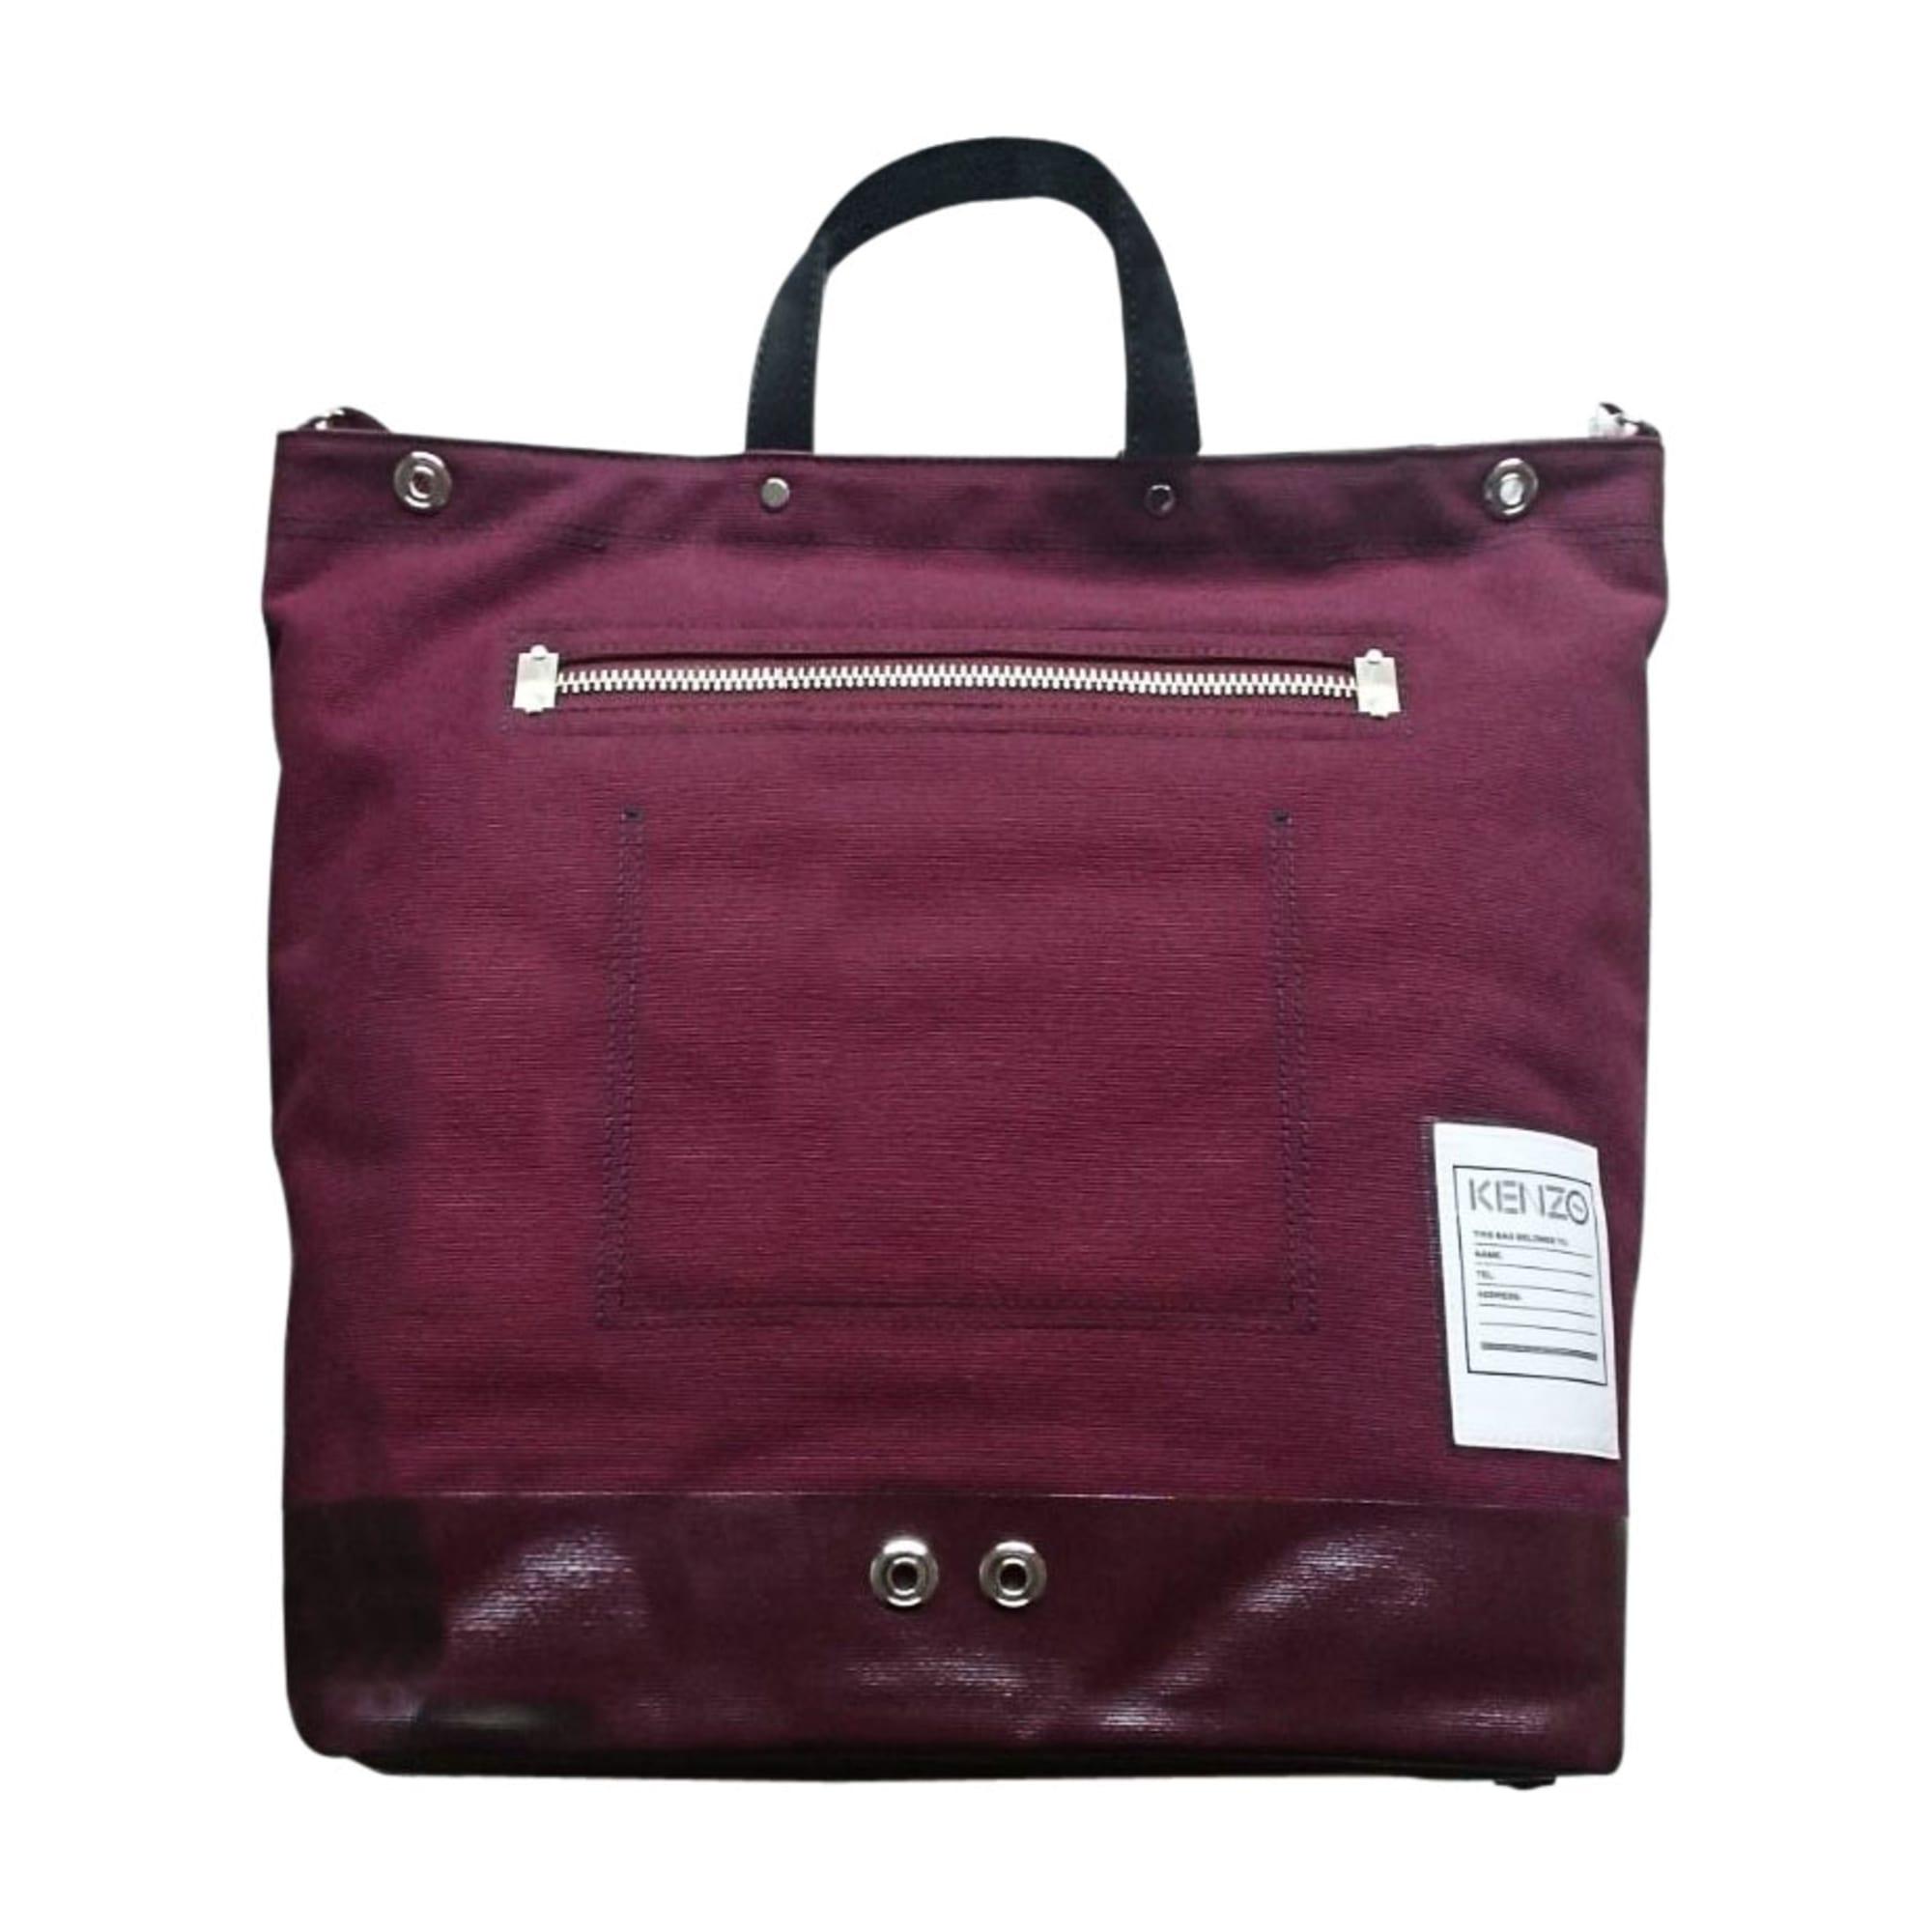 Non-Leather Handbag KENZO Red, burgundy